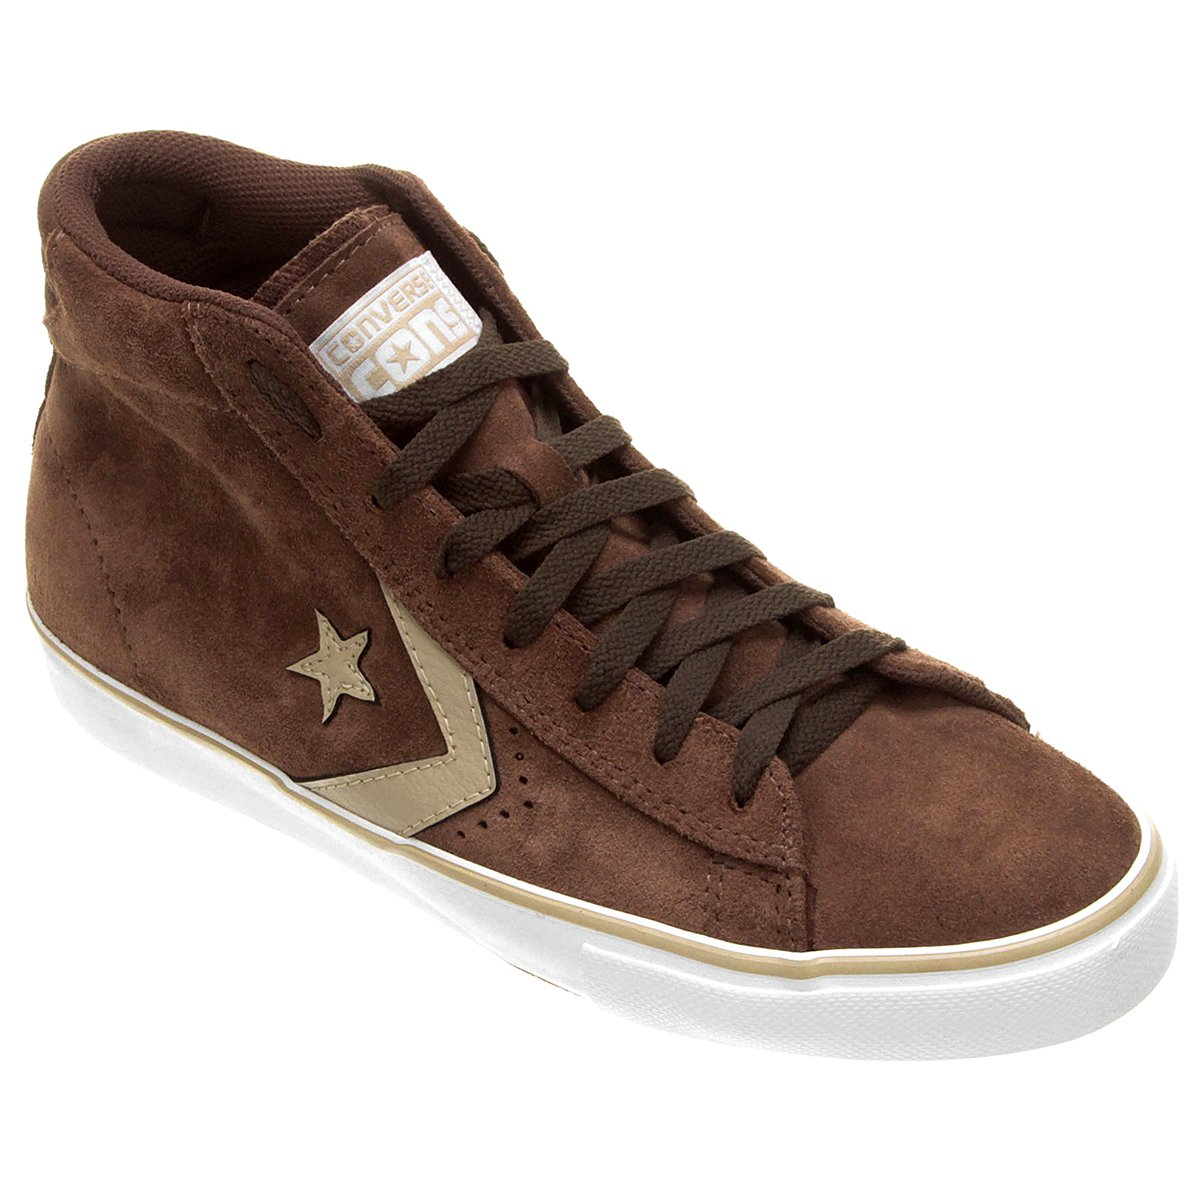 tênis converse all star pro leather vulc ox